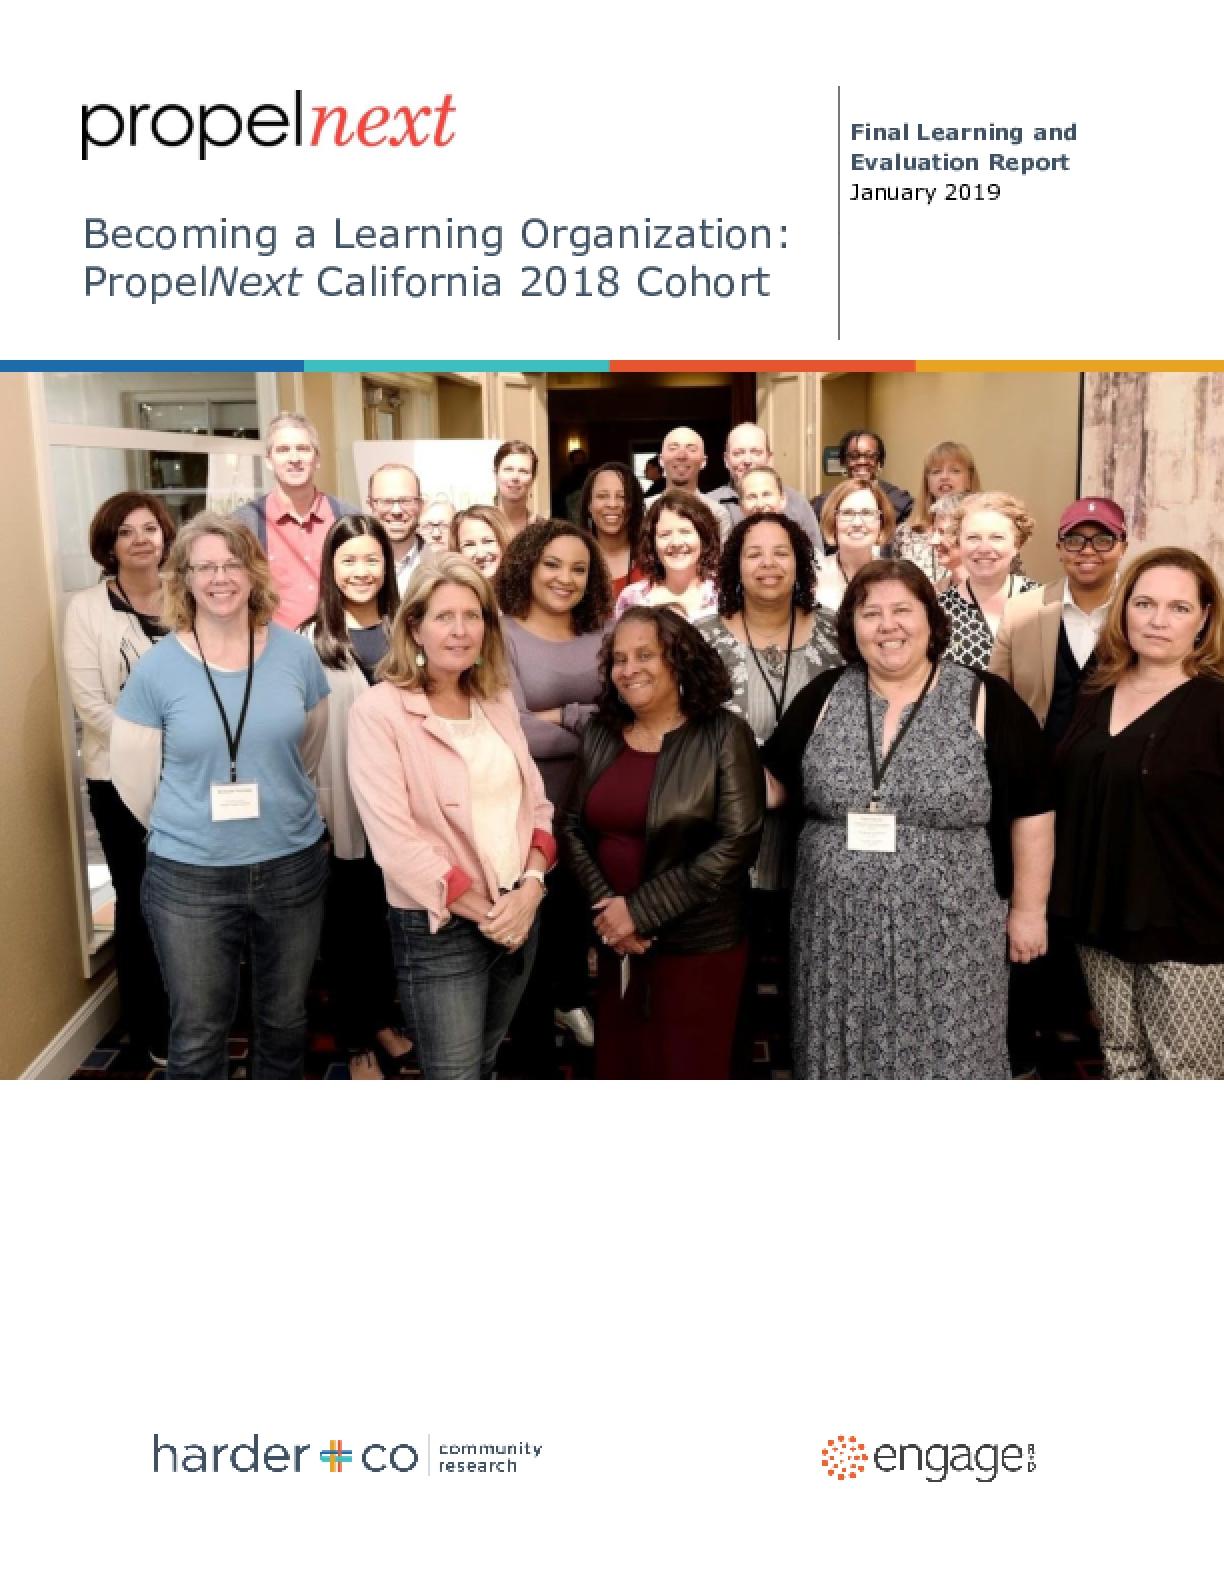 Becoming a Learning Organization: PropelNext California 2018 Cohort